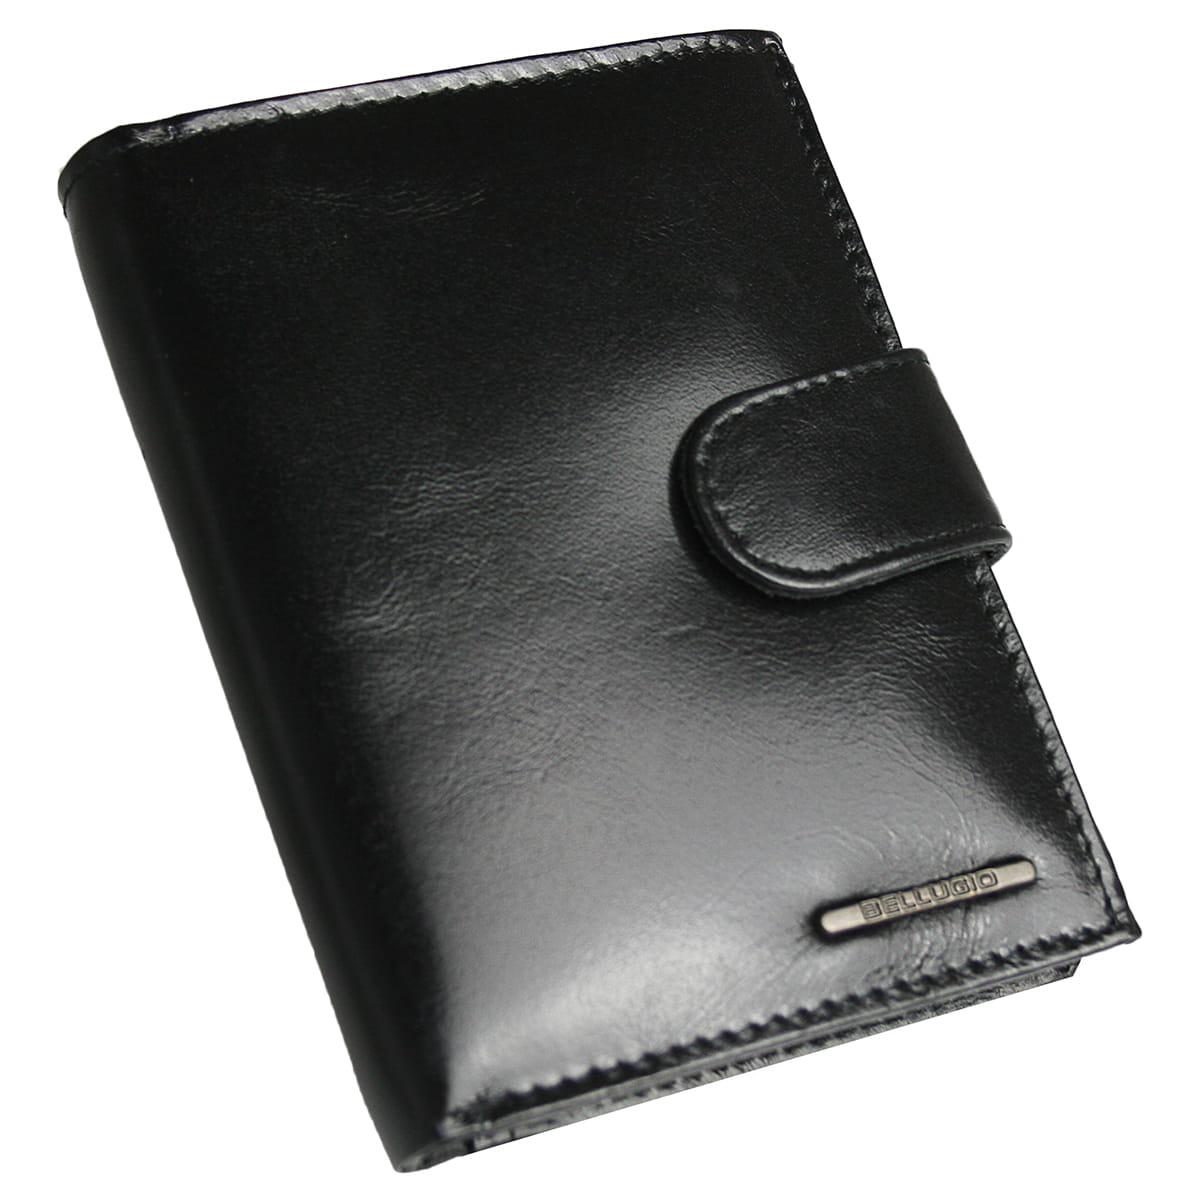 b951bd5c68fde Elegancki skórzany portfel męski Bellugio